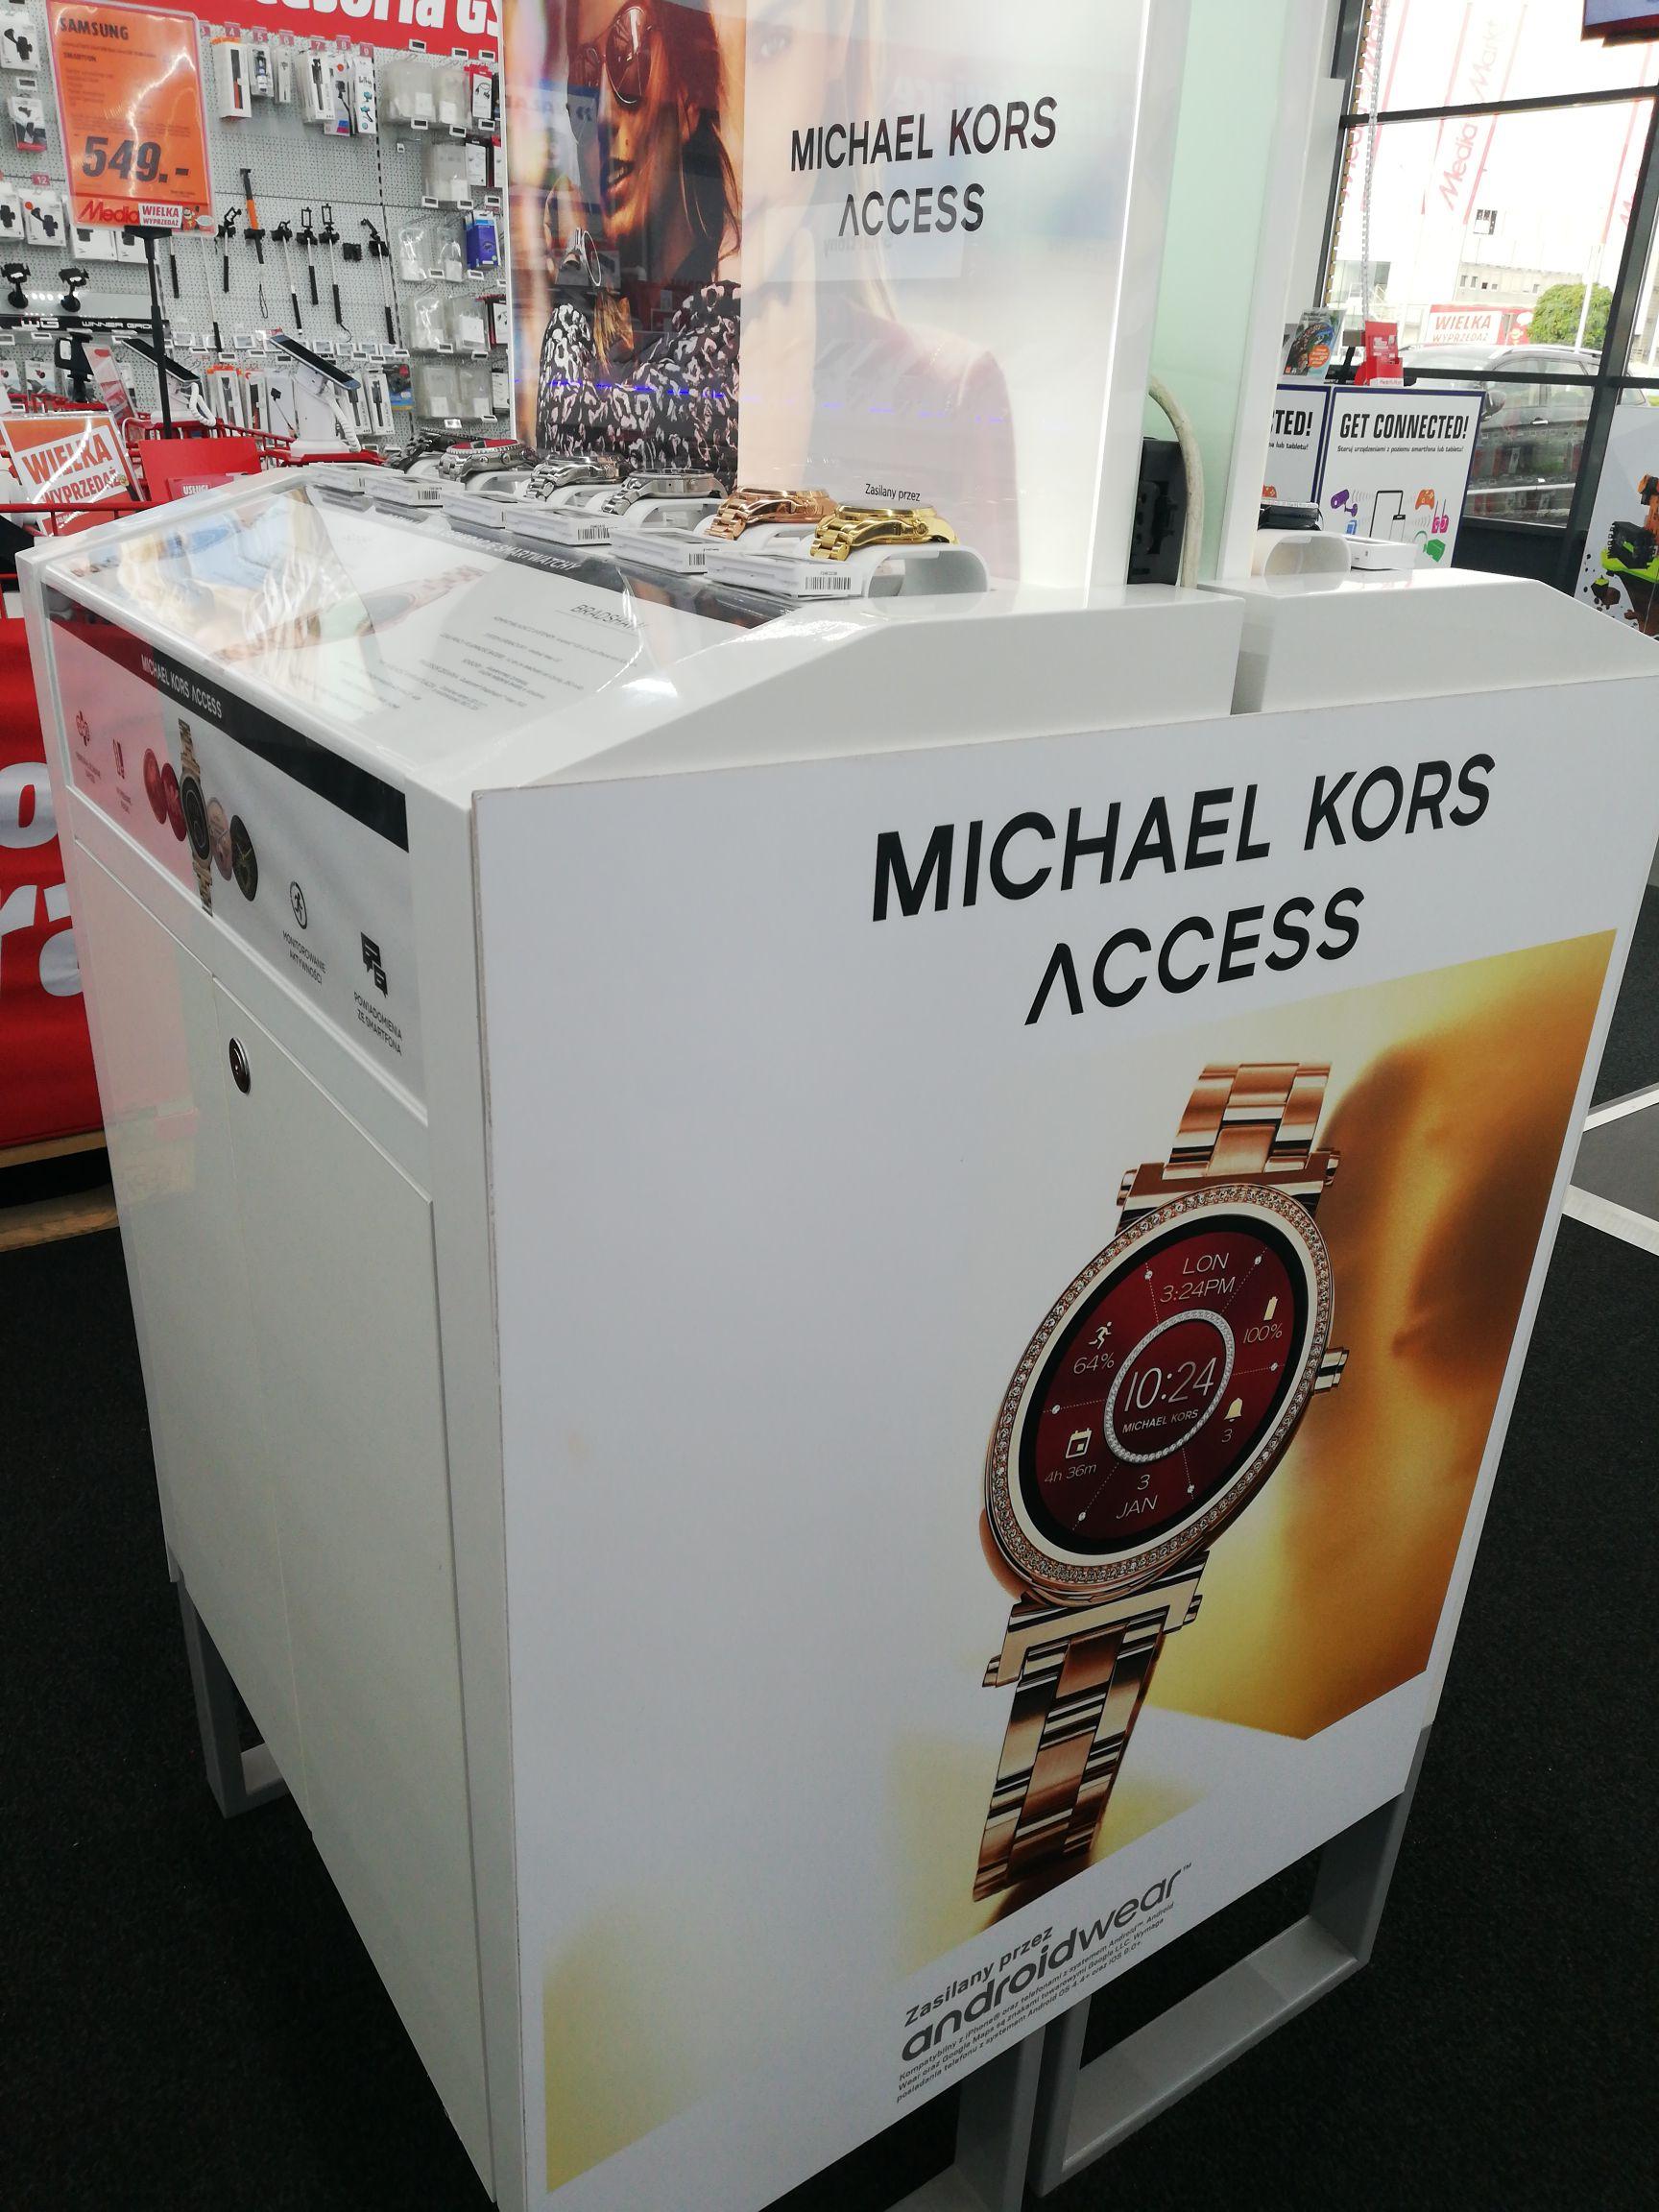 Smartwatche FOSSIL/MICHAEL KORS/DIESEL ON/ARMANI